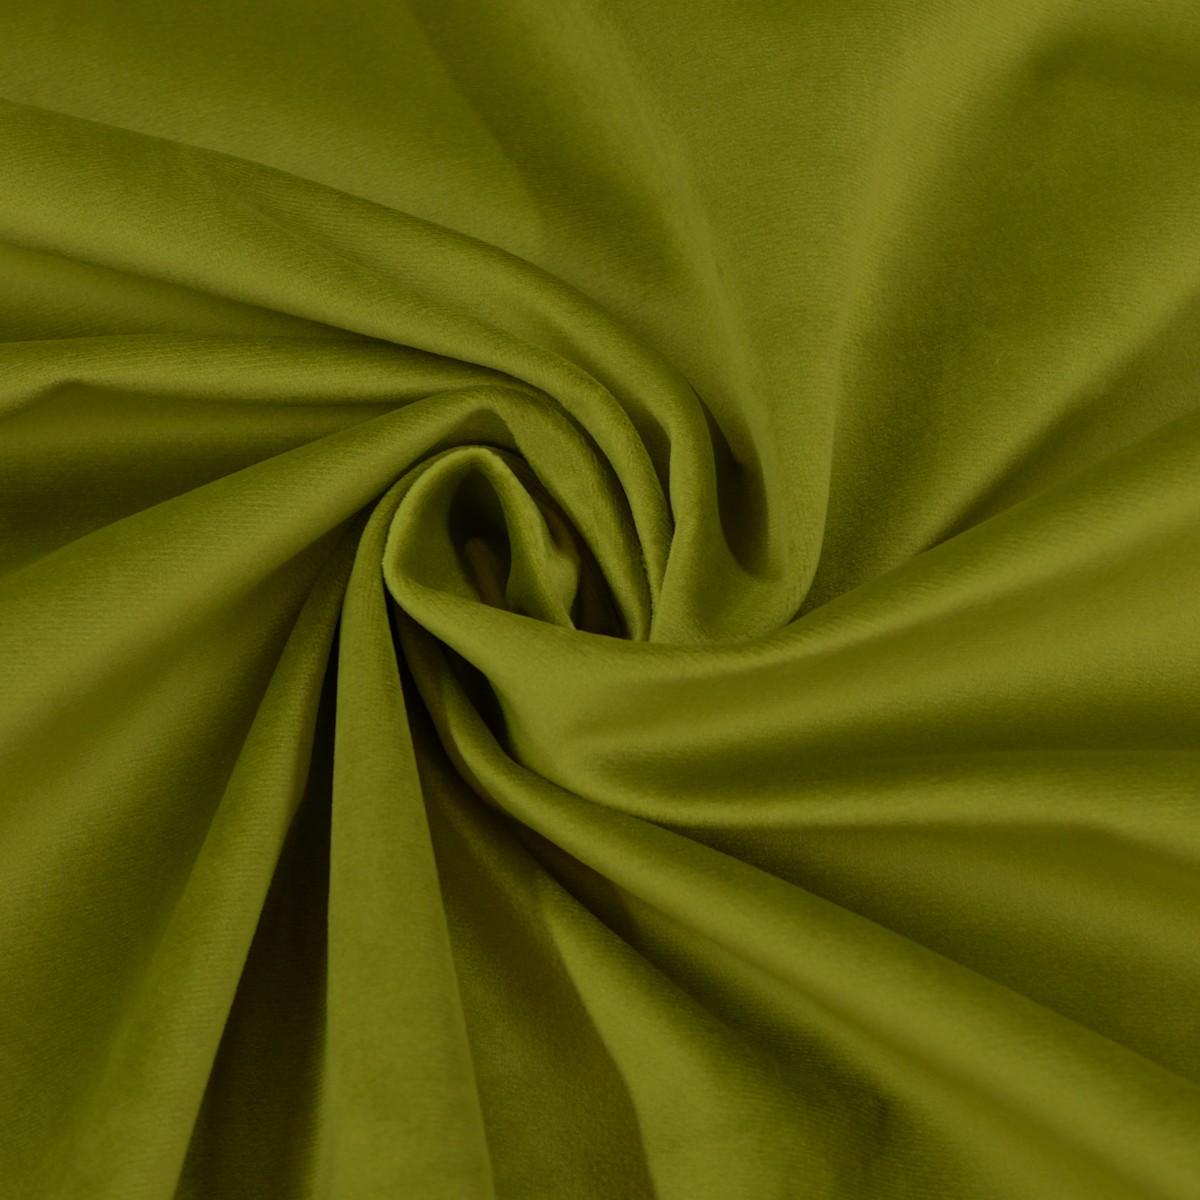 Möbelstoff Polsterstoff Bezugstoff Samtstoff Samt moos grün 1,40m breit